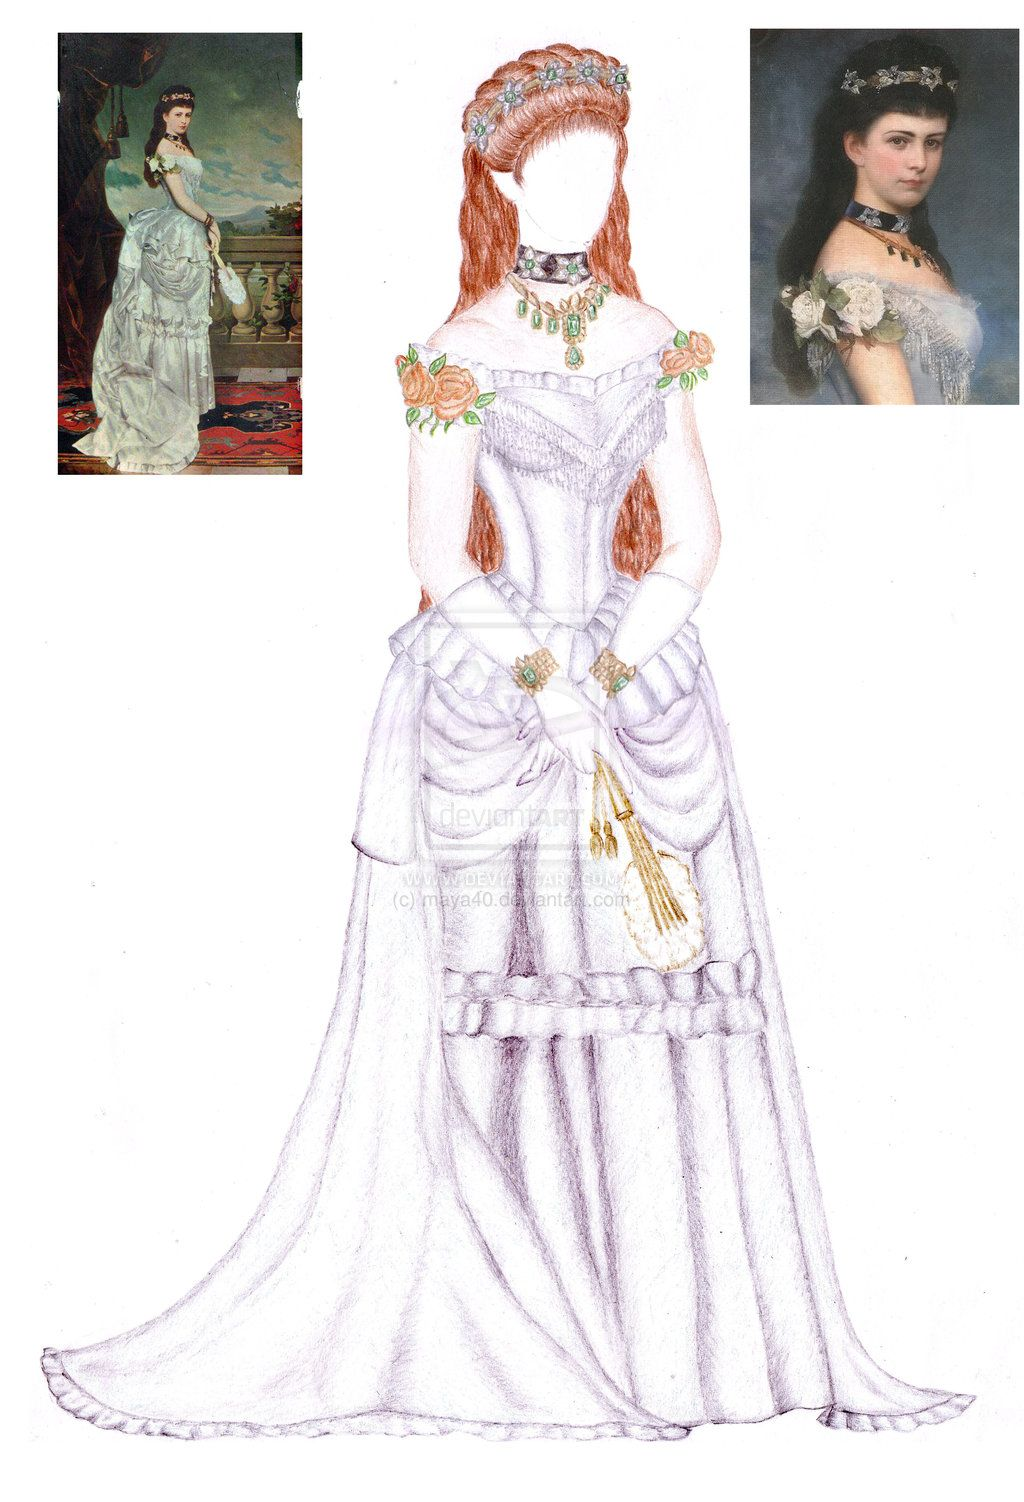 Sissi Empress Elisabeth doll clothing by maya40.deviantart.com on @deviantART